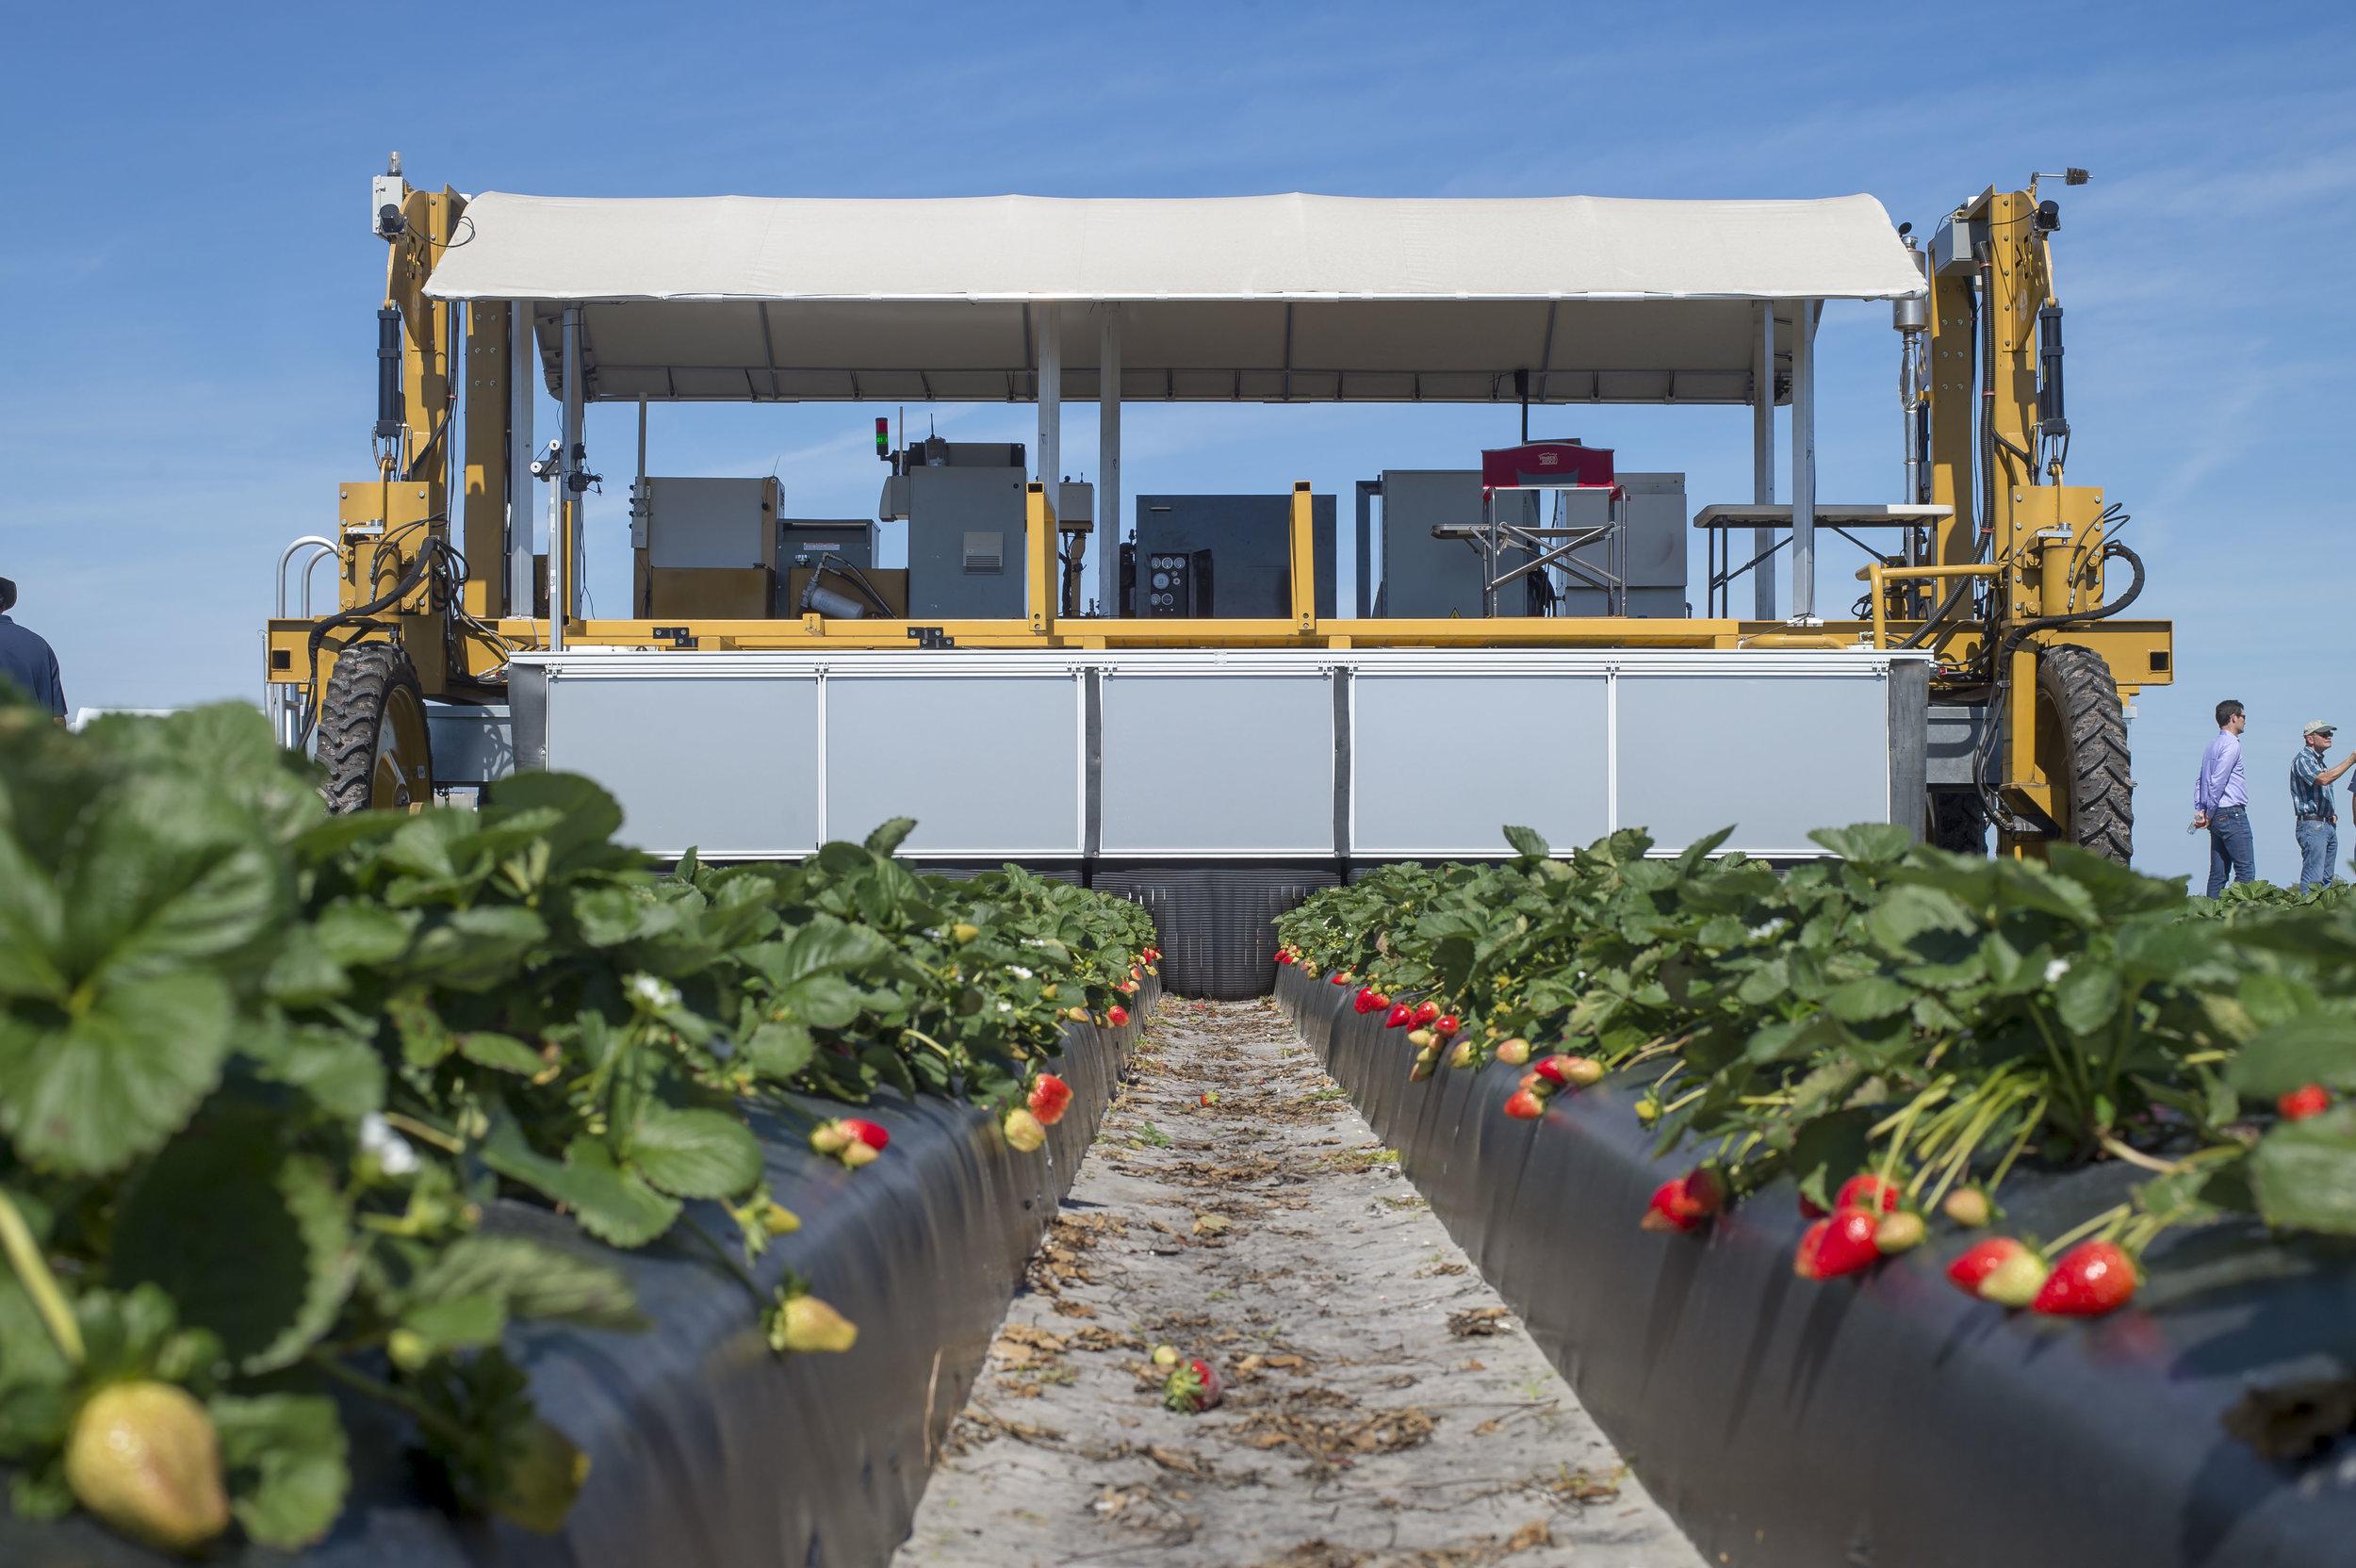 Man vs. machine - The Prize? Strawberries.